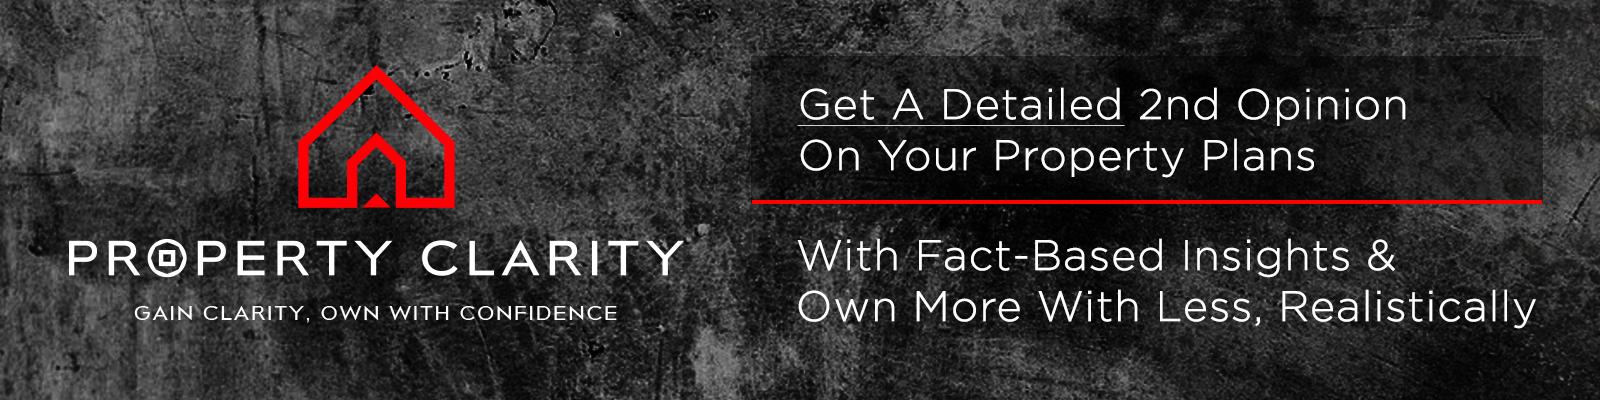 propclarity-ad-banner-v3.jpg